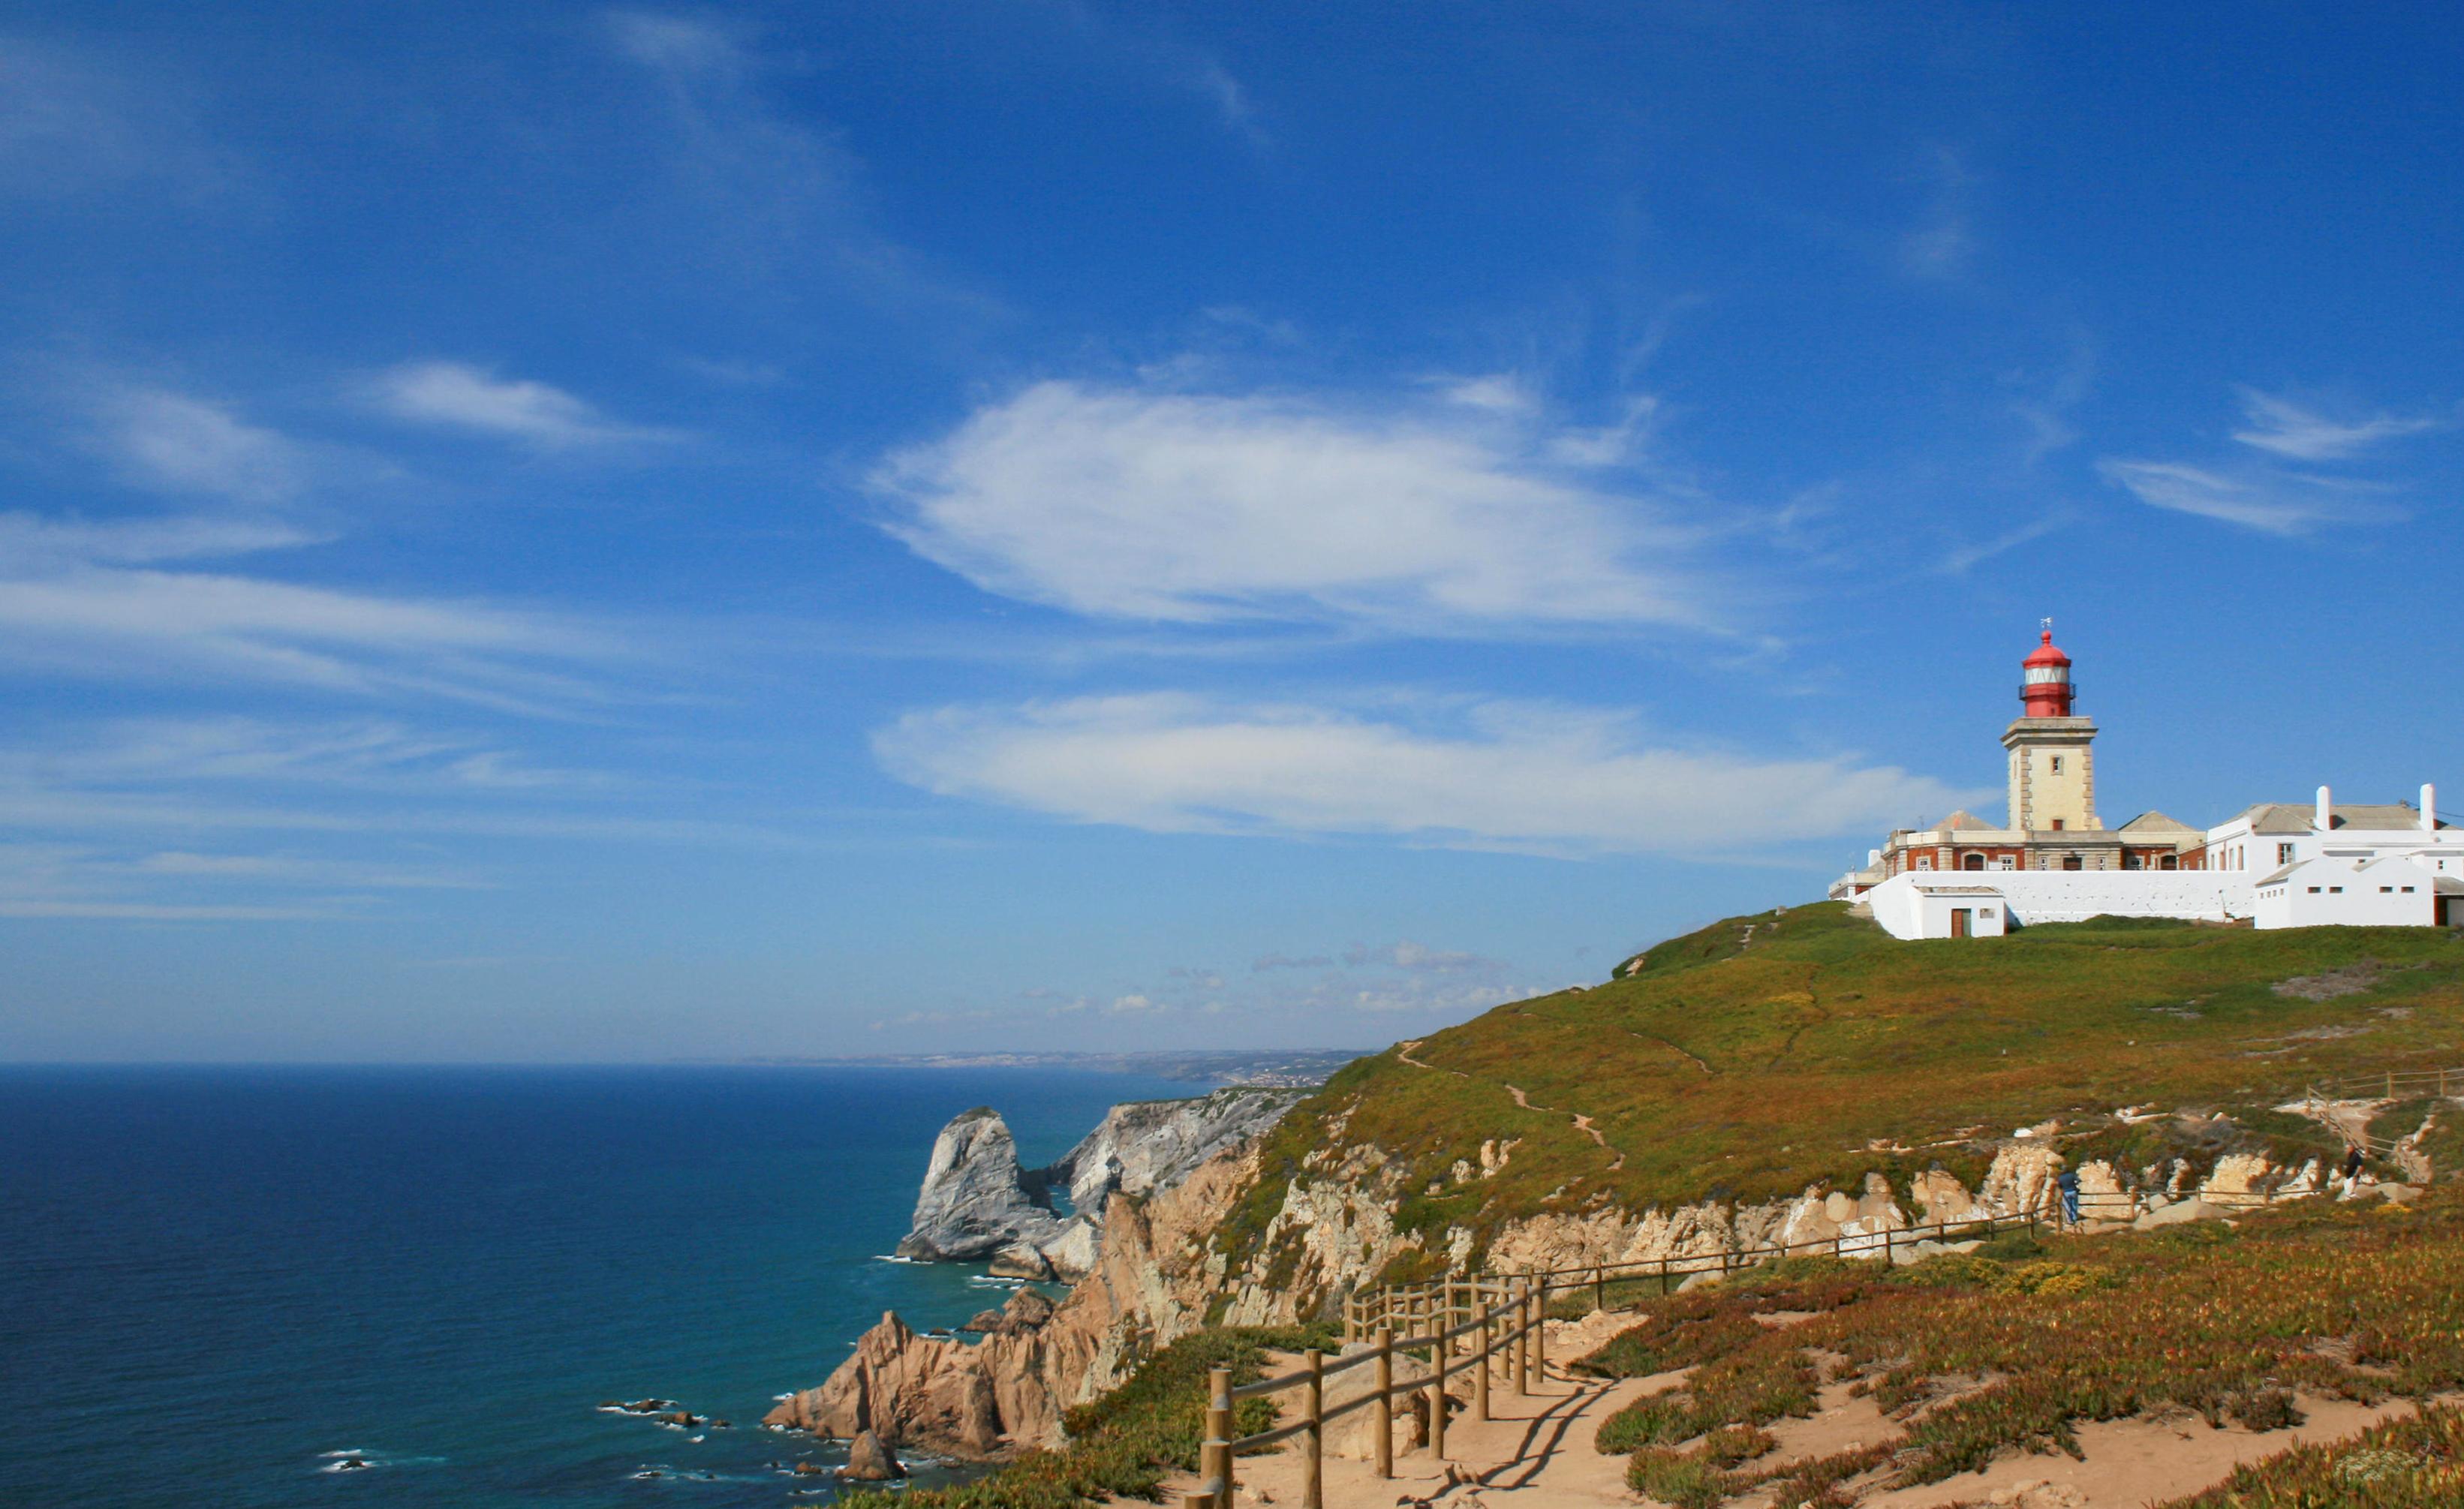 Cabo da roca turismo en portugal - Banarse con delfines portugal ...